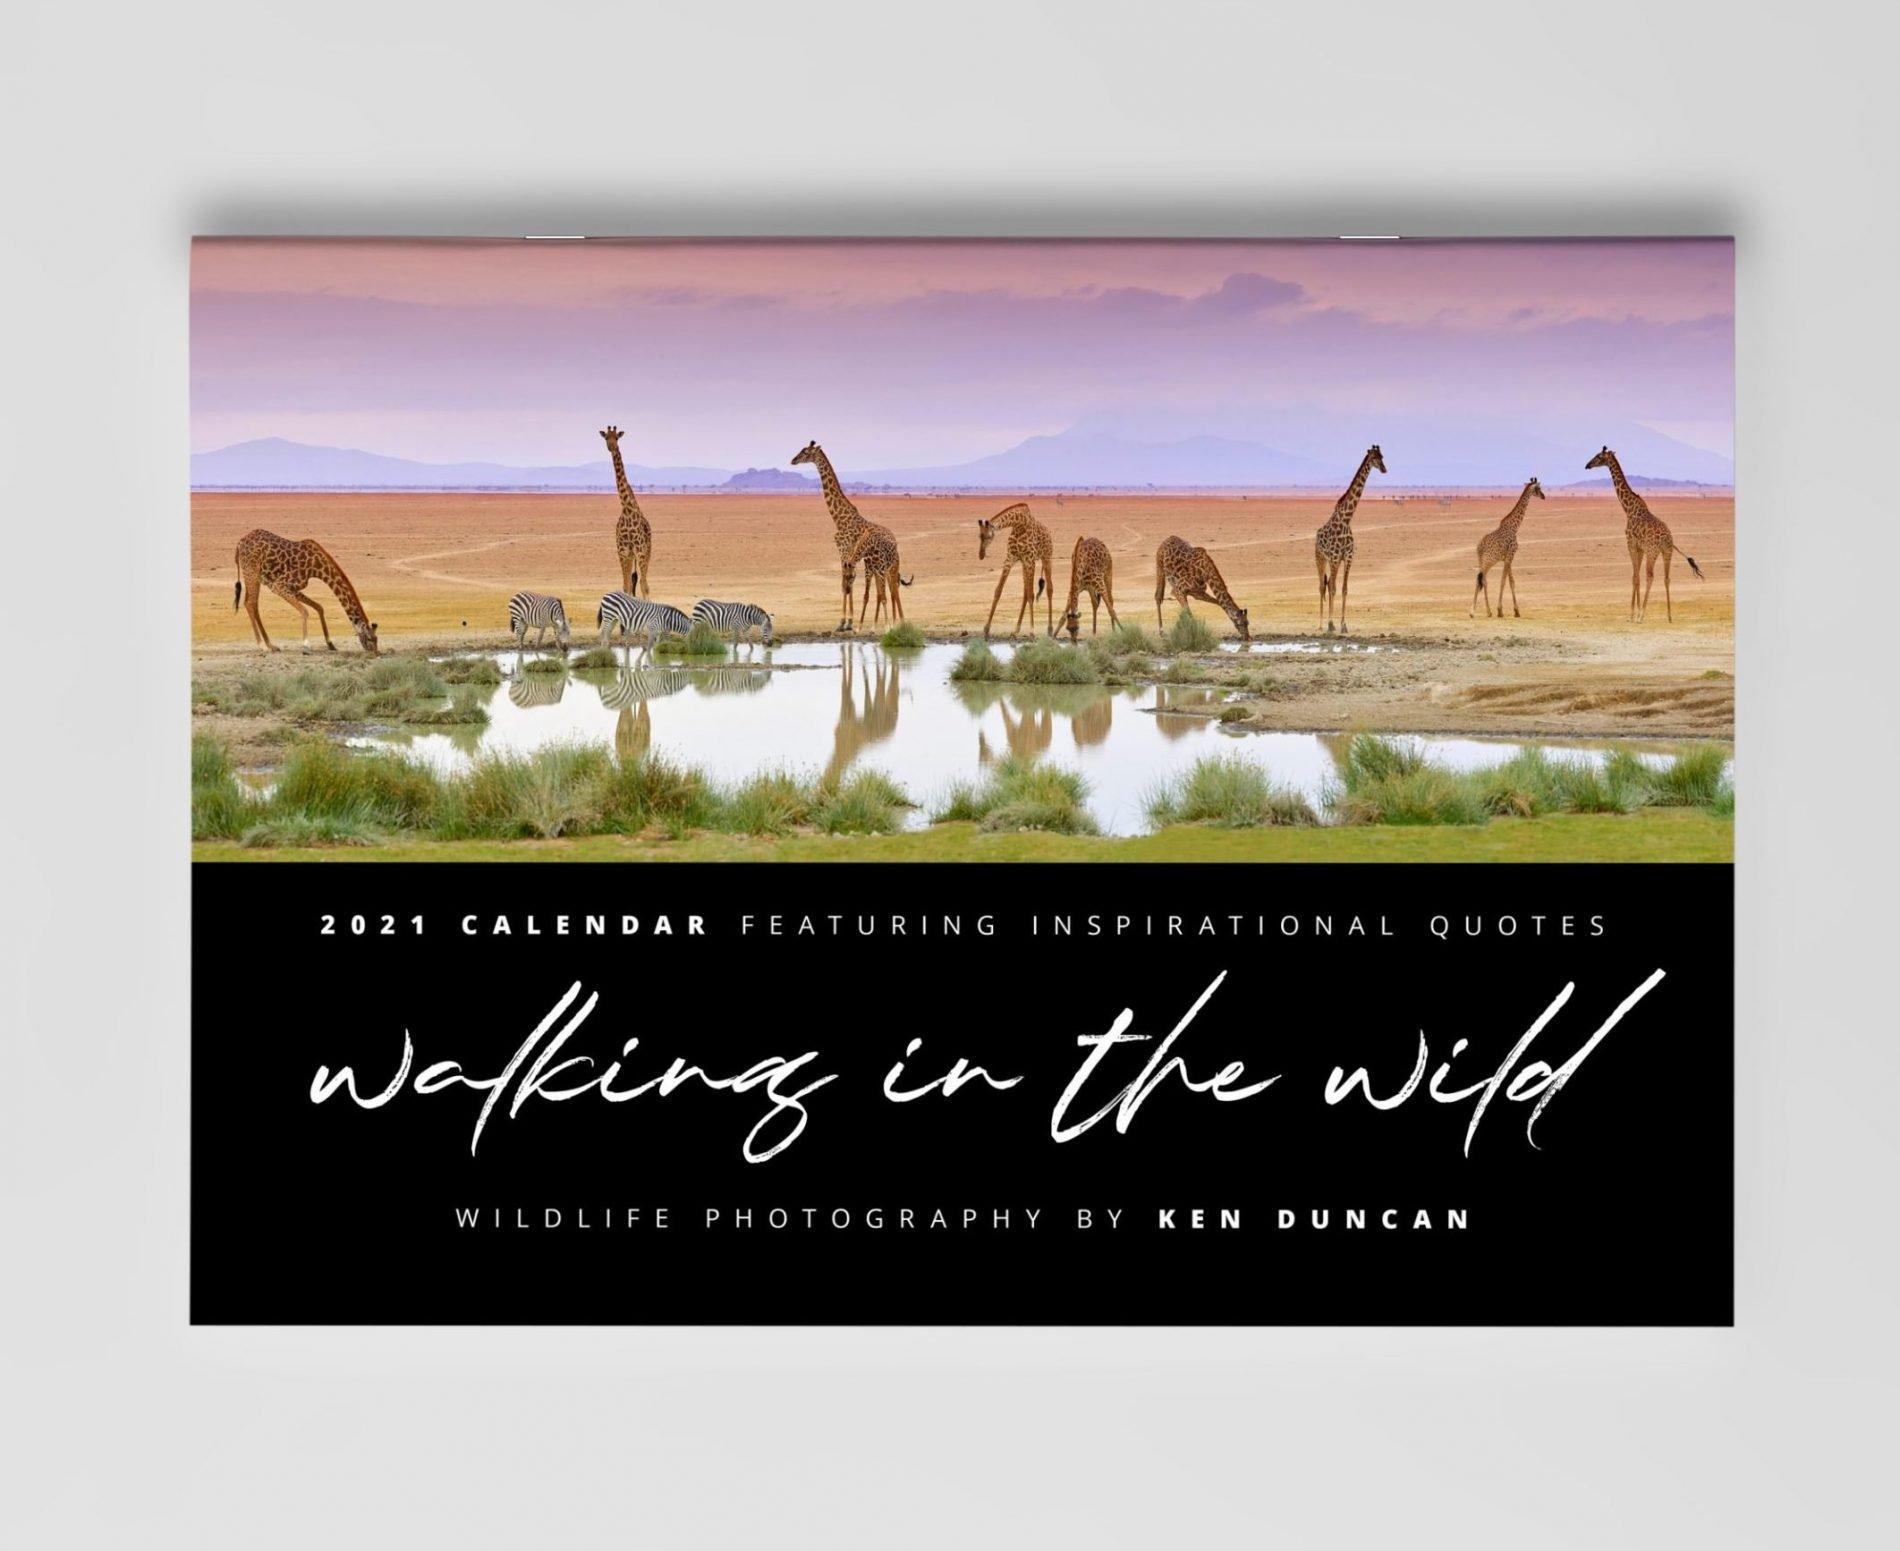 2021 Walking in the Wild A4 Calendar